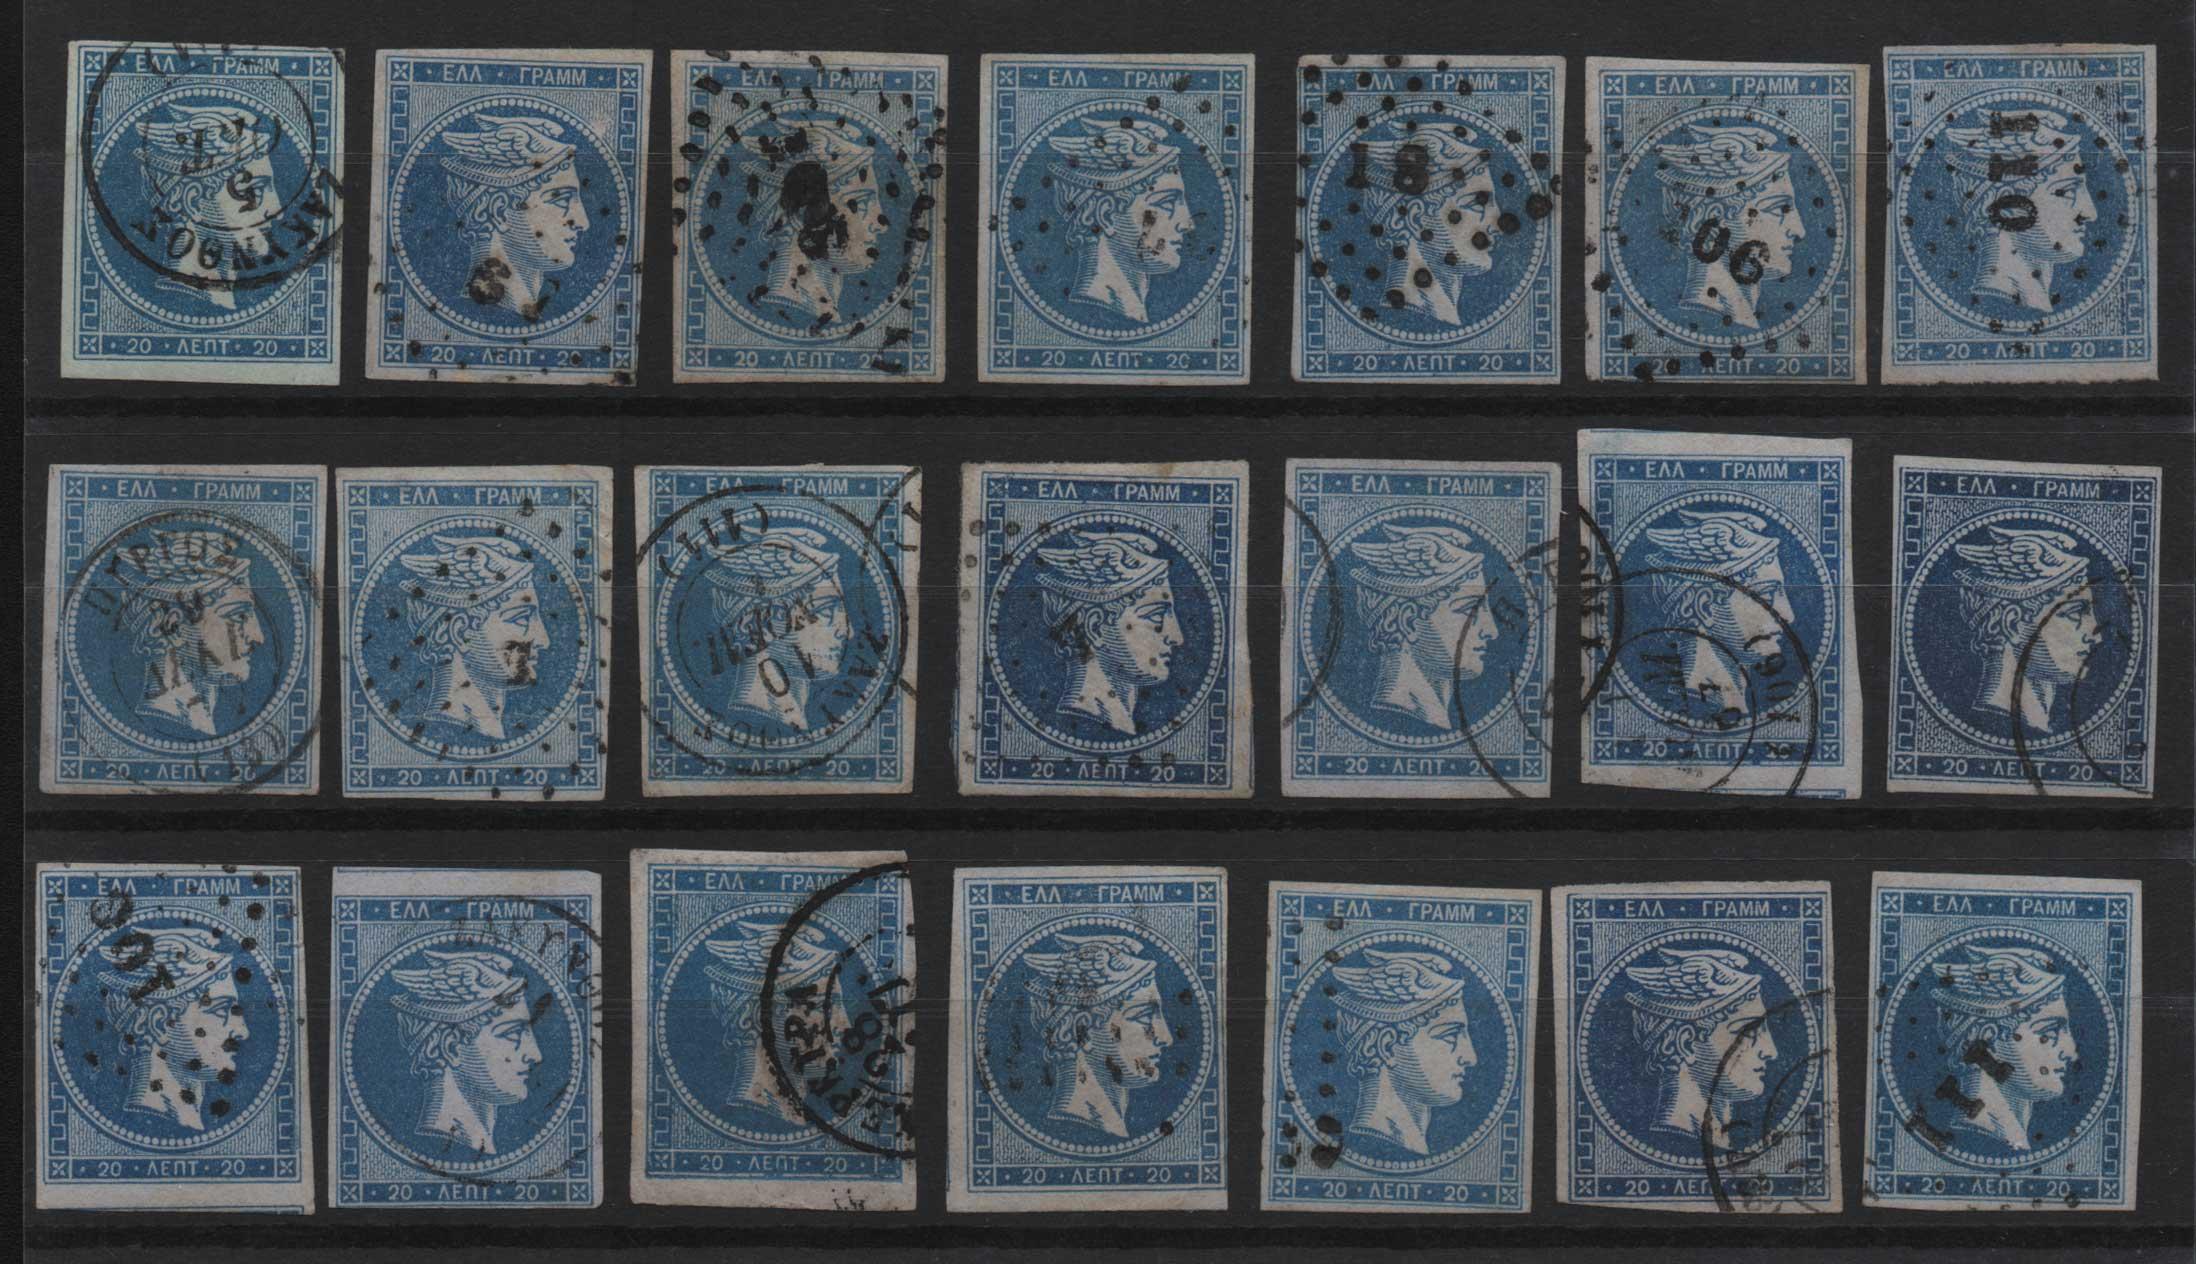 Lot 35 - -  LARGE HERMES HEAD large hermes head -  Athens Auctions Public Auction 77 General Stamp Sale